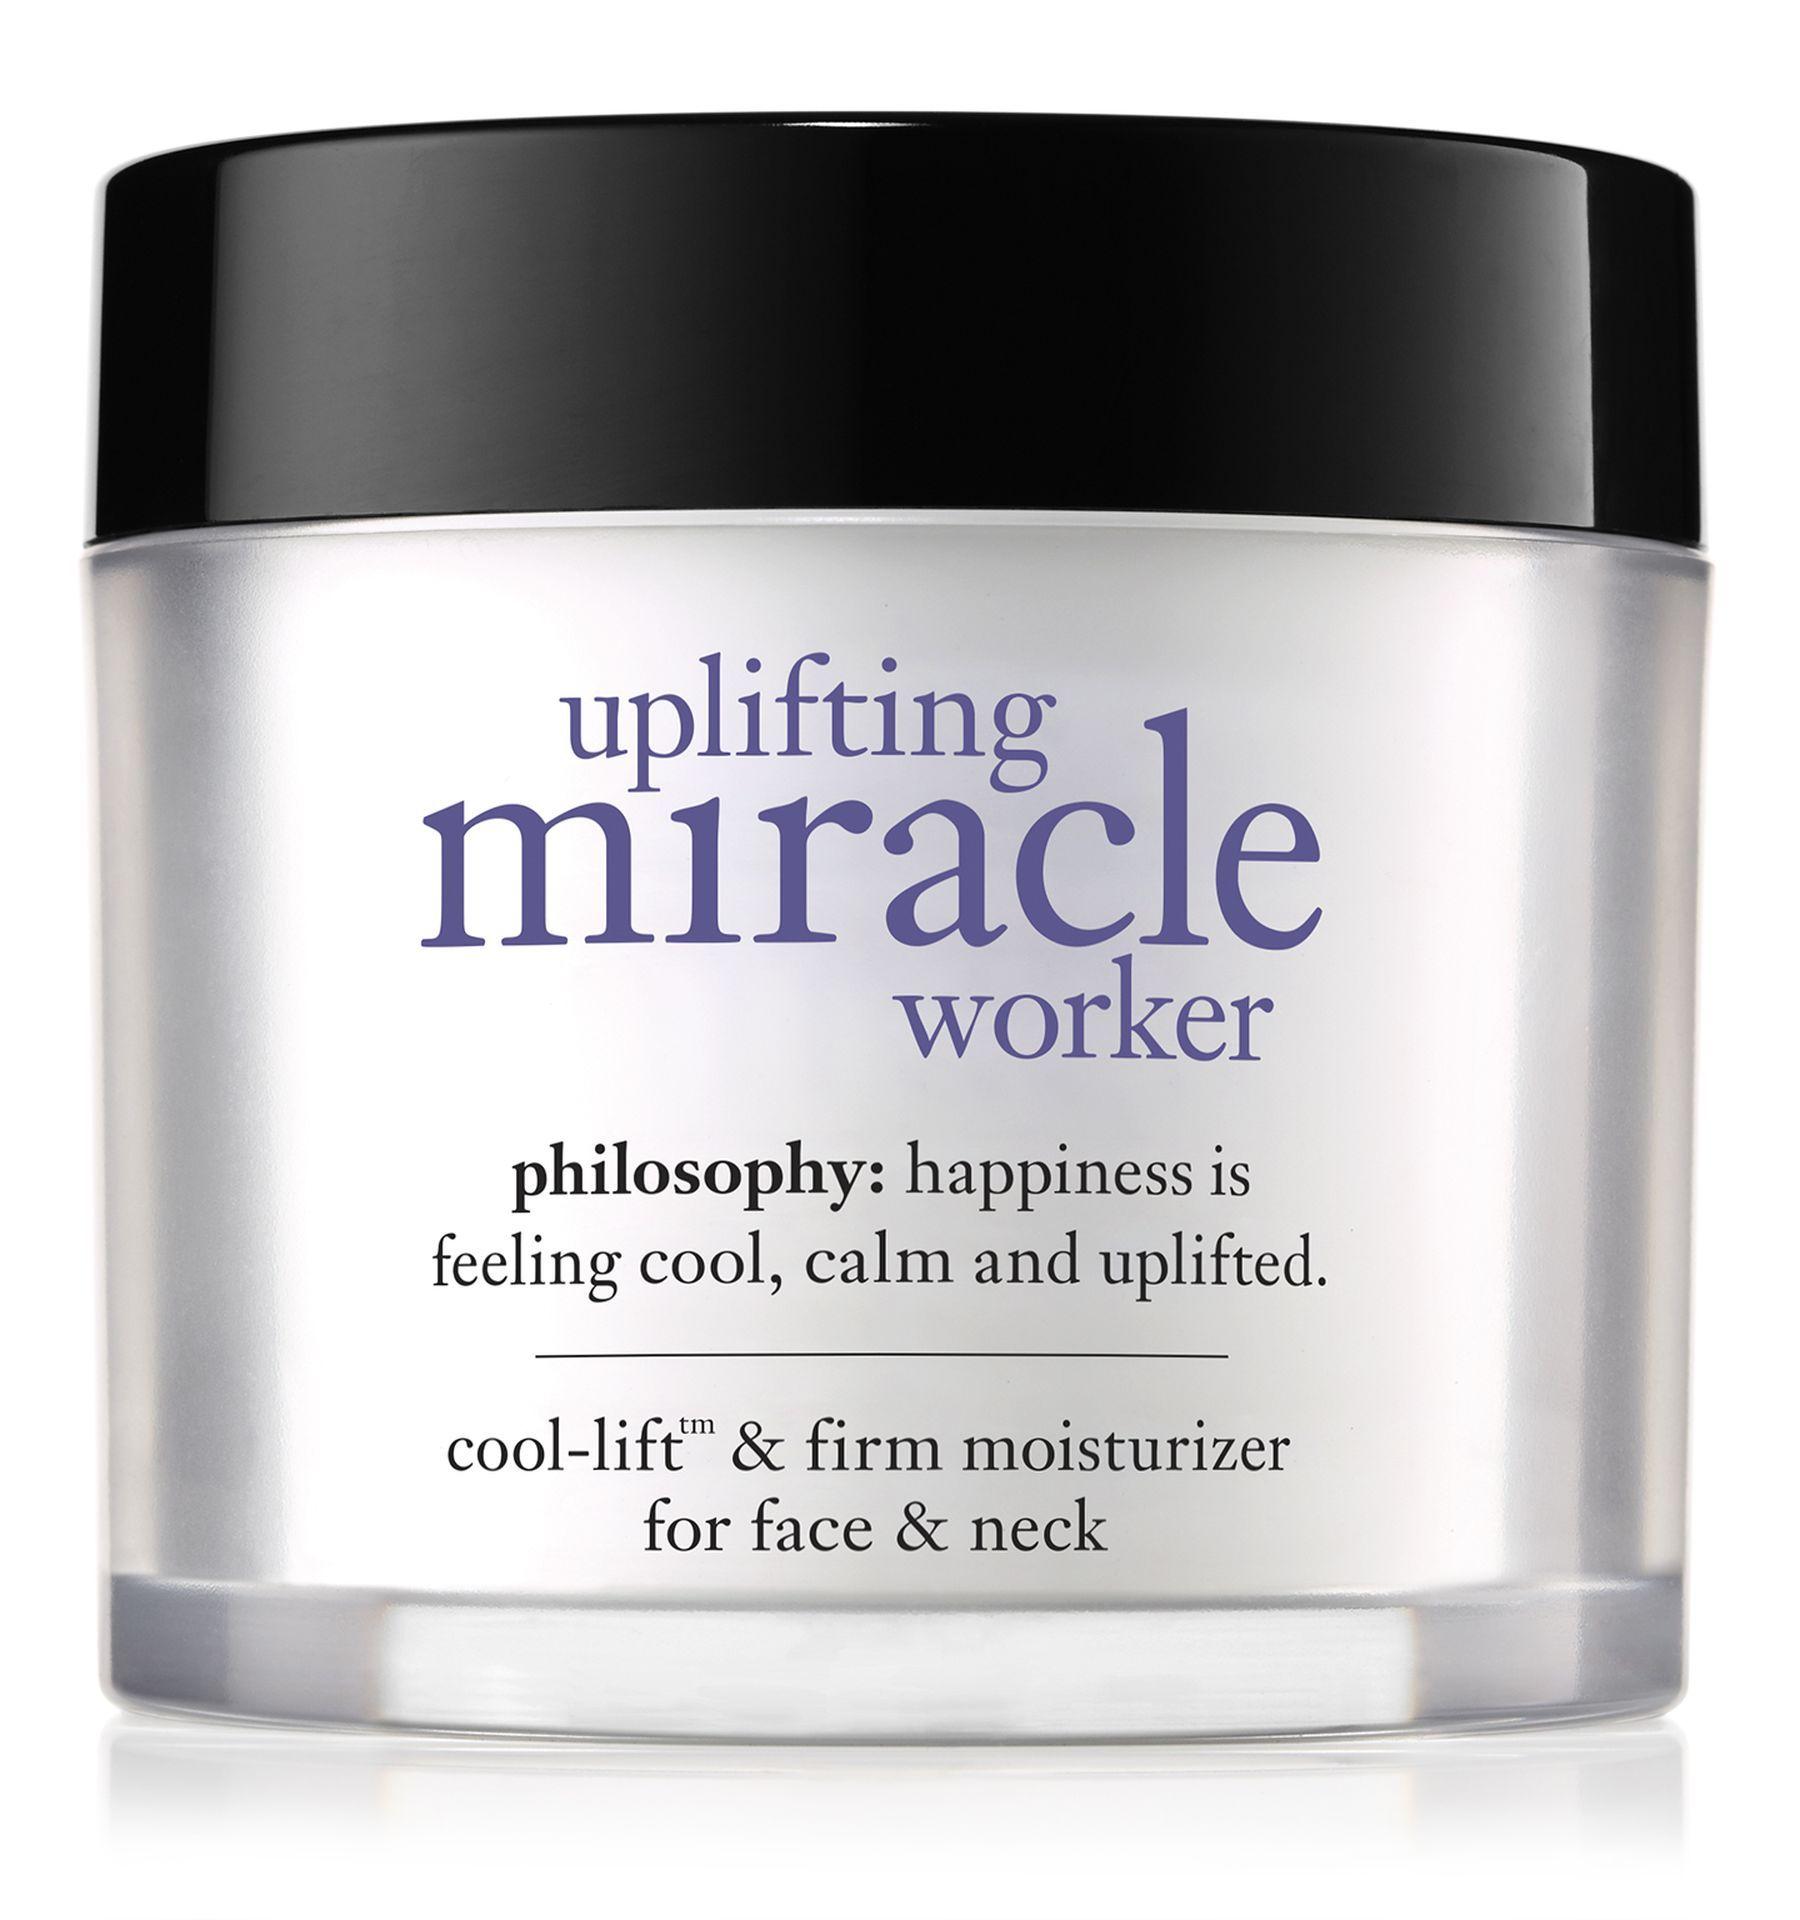 Http Www Philosophy Com Uplifting Miracle Worker Face Moisturizer Html Cgid C112 Moisturizer Diy Moisturizer Healthy Skin Cream